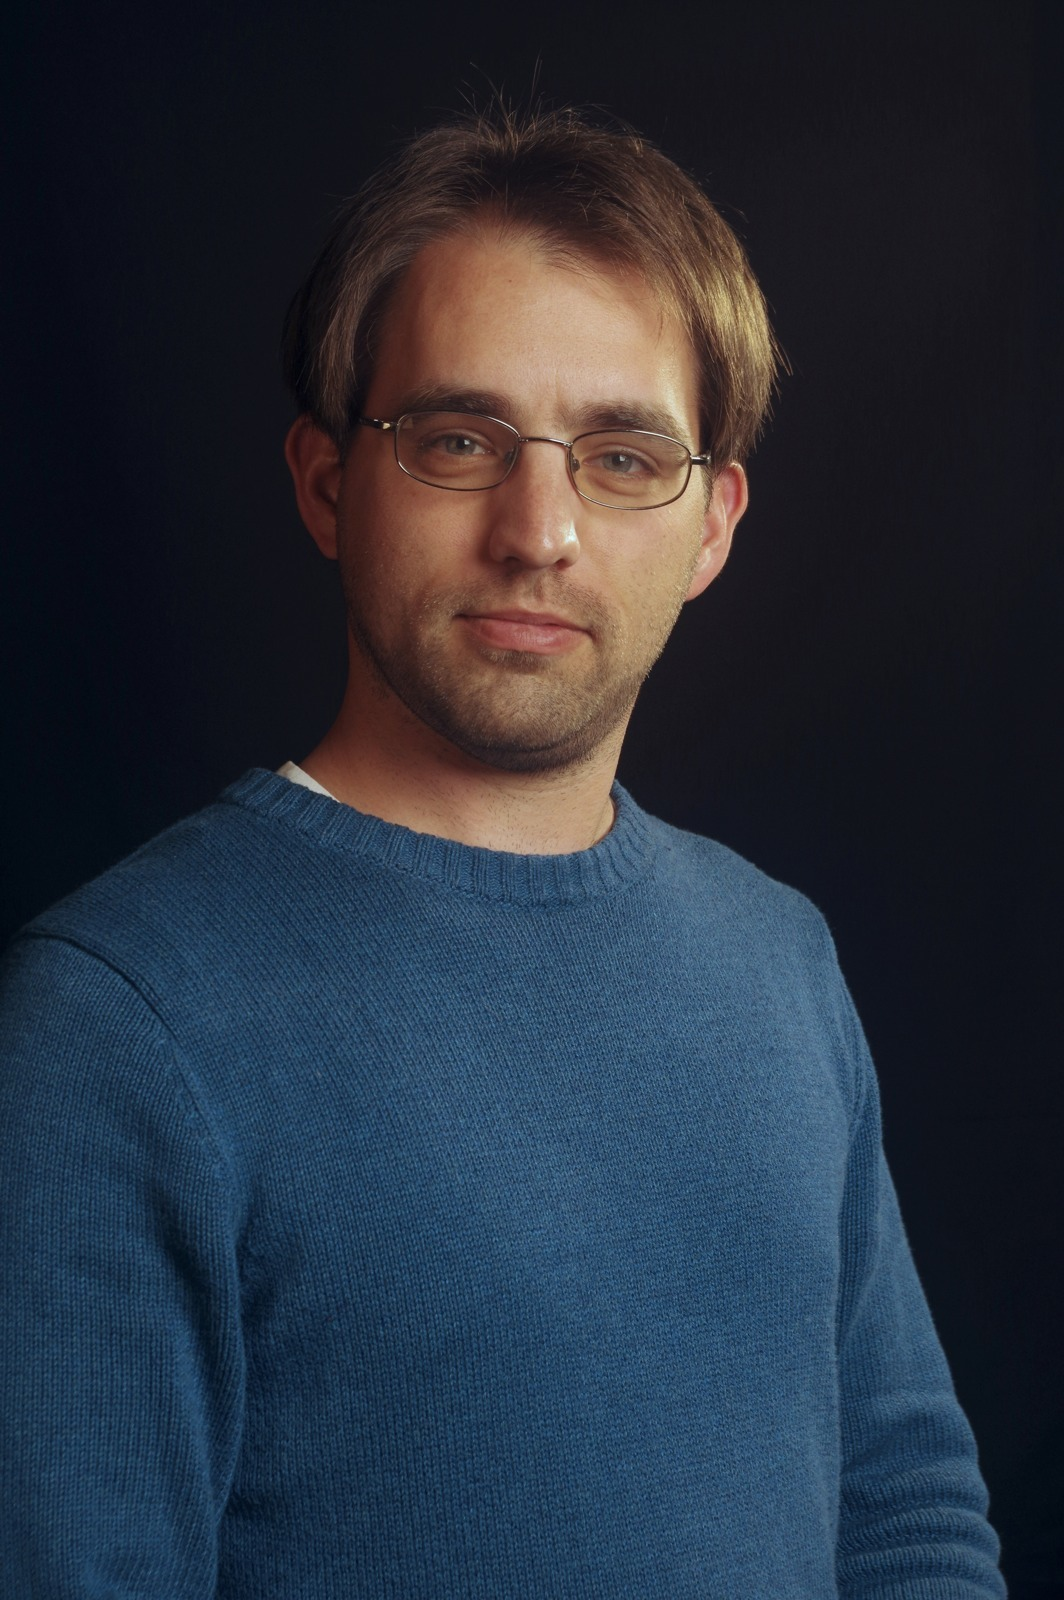 Michael Harriss